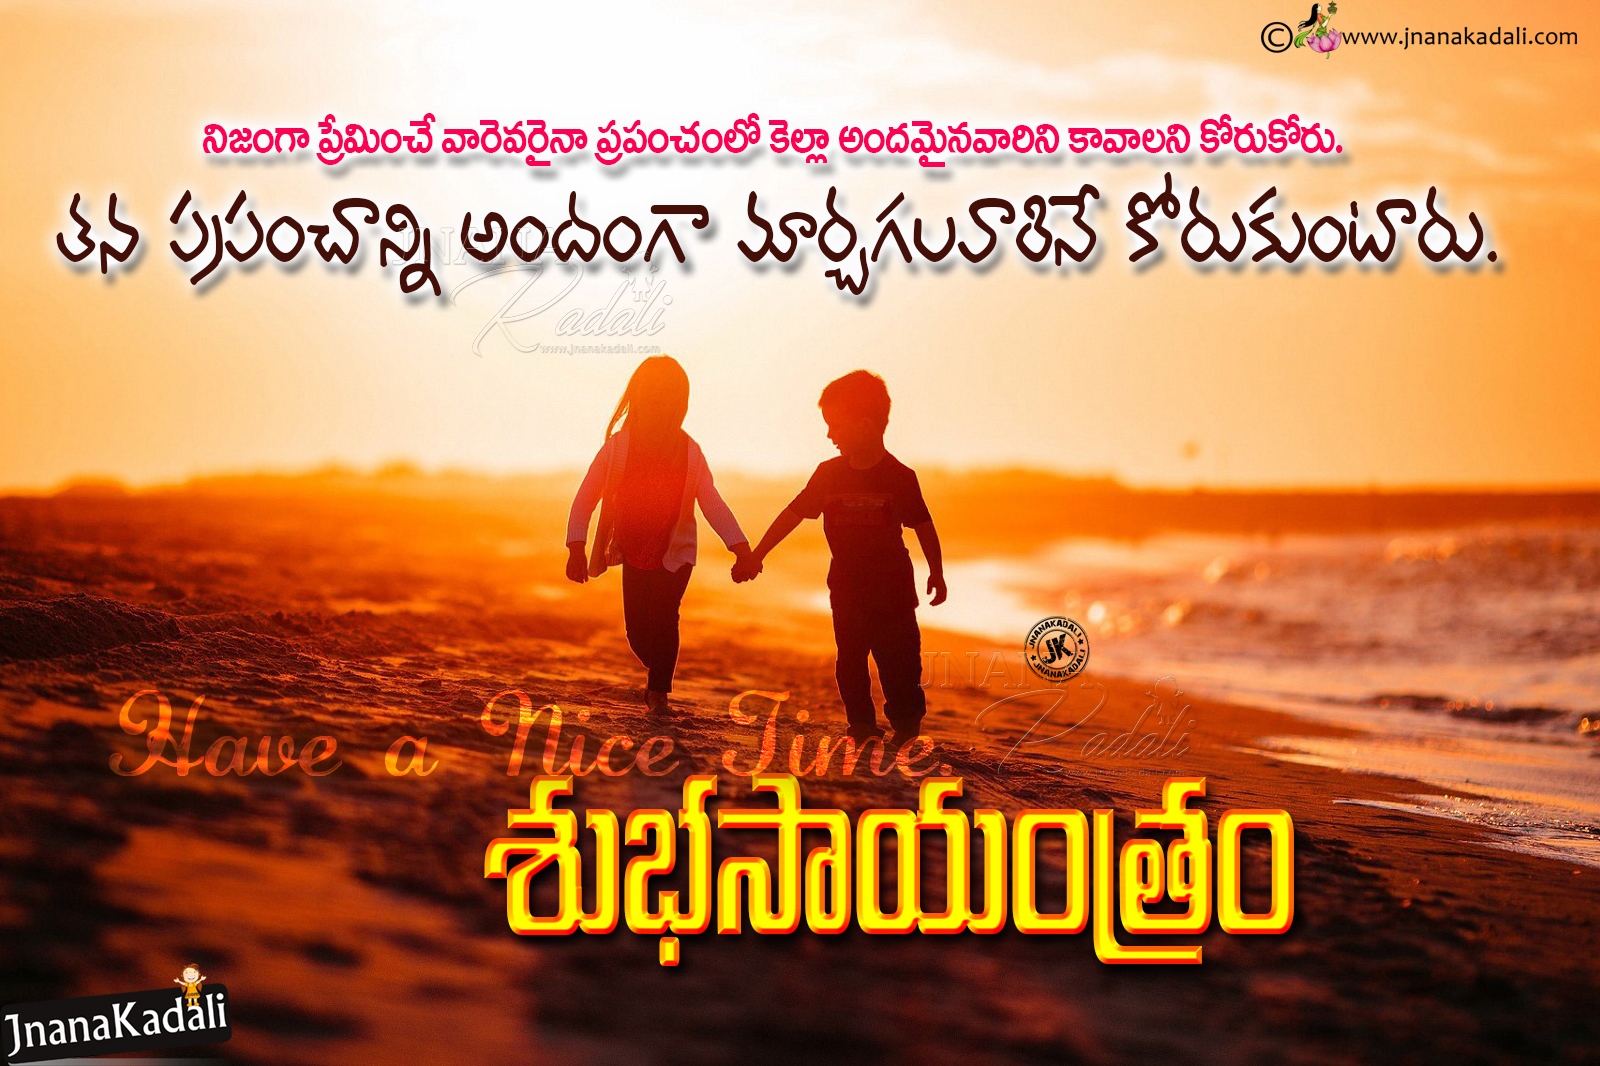 Good Evening Telugu Motivational Quotes Messages Best Good Evening